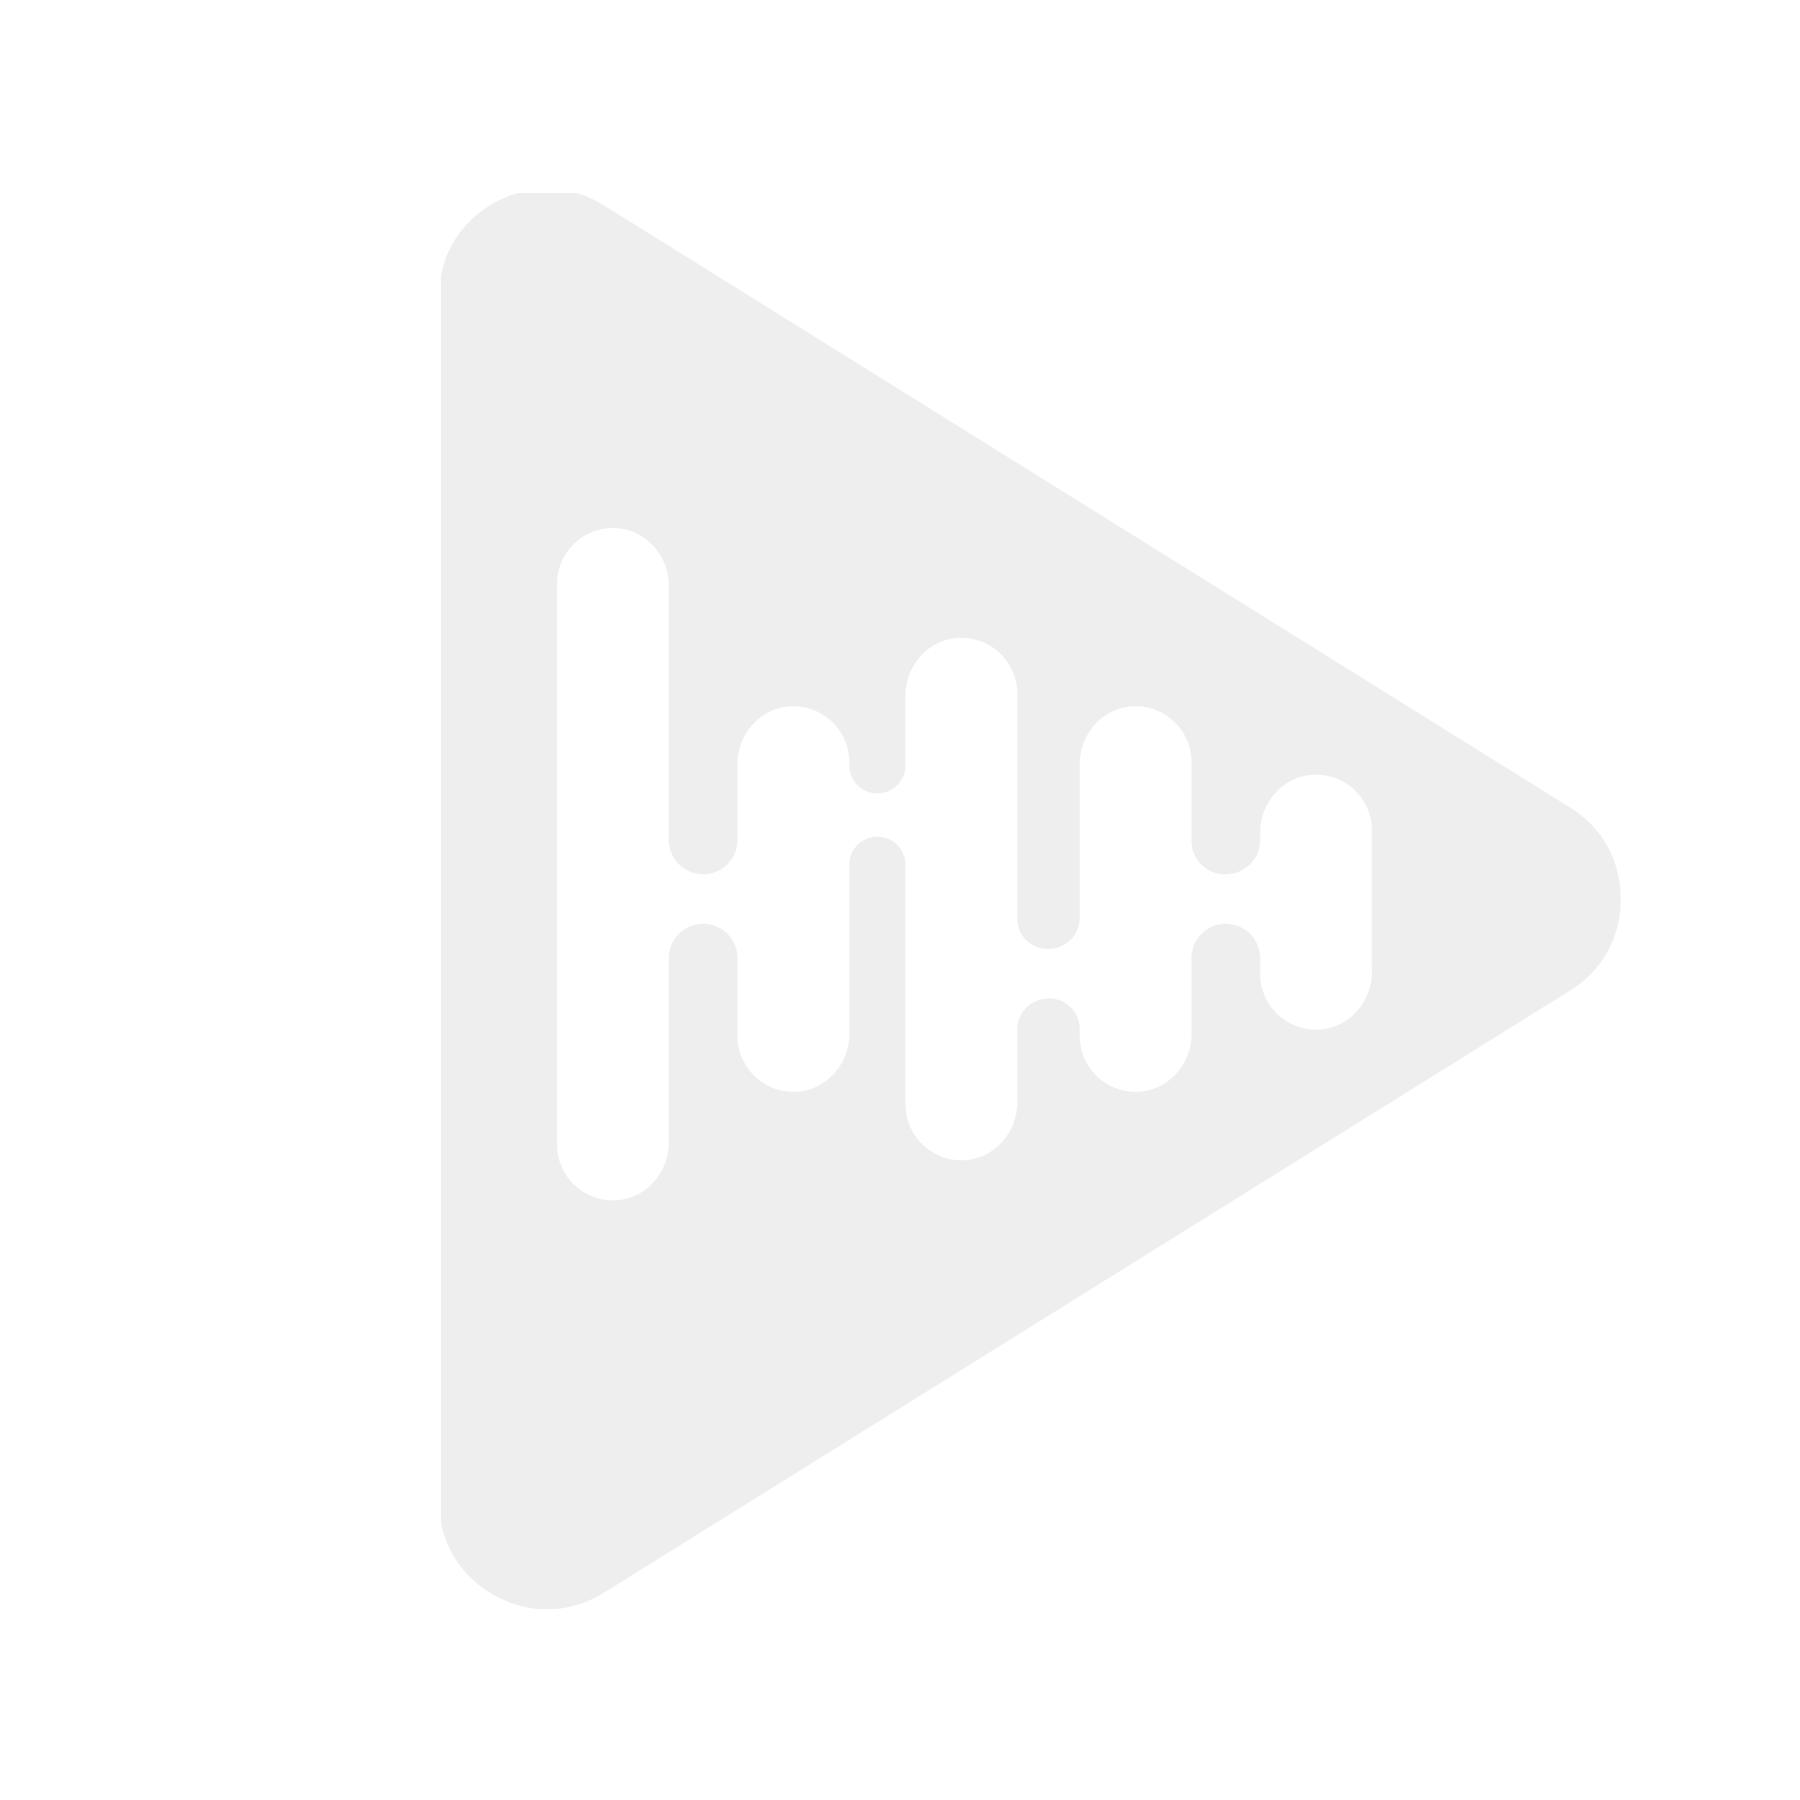 Stinger SAS - Spraylim, 12oz kontaktlim på boks, (355ml)